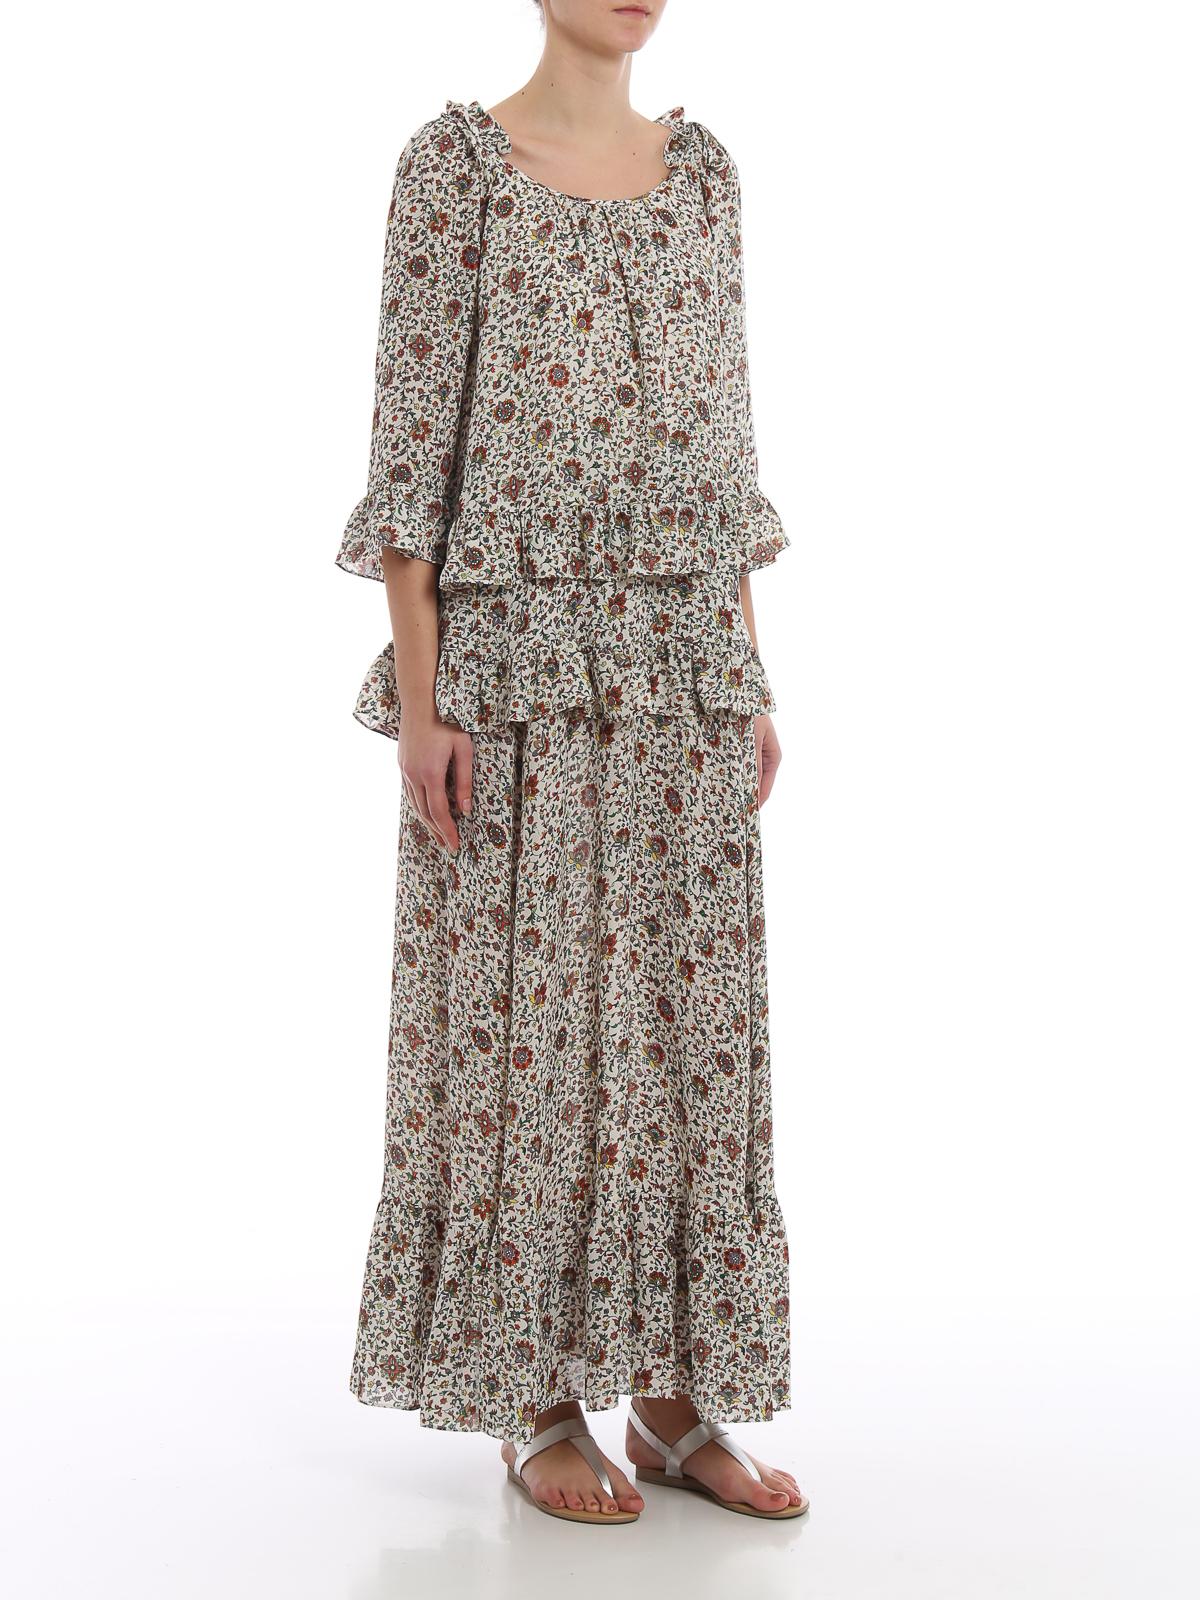 4f09c2a9381c TORY BURCH  maxi dresses online - Flower print ruffled silk maxi dress